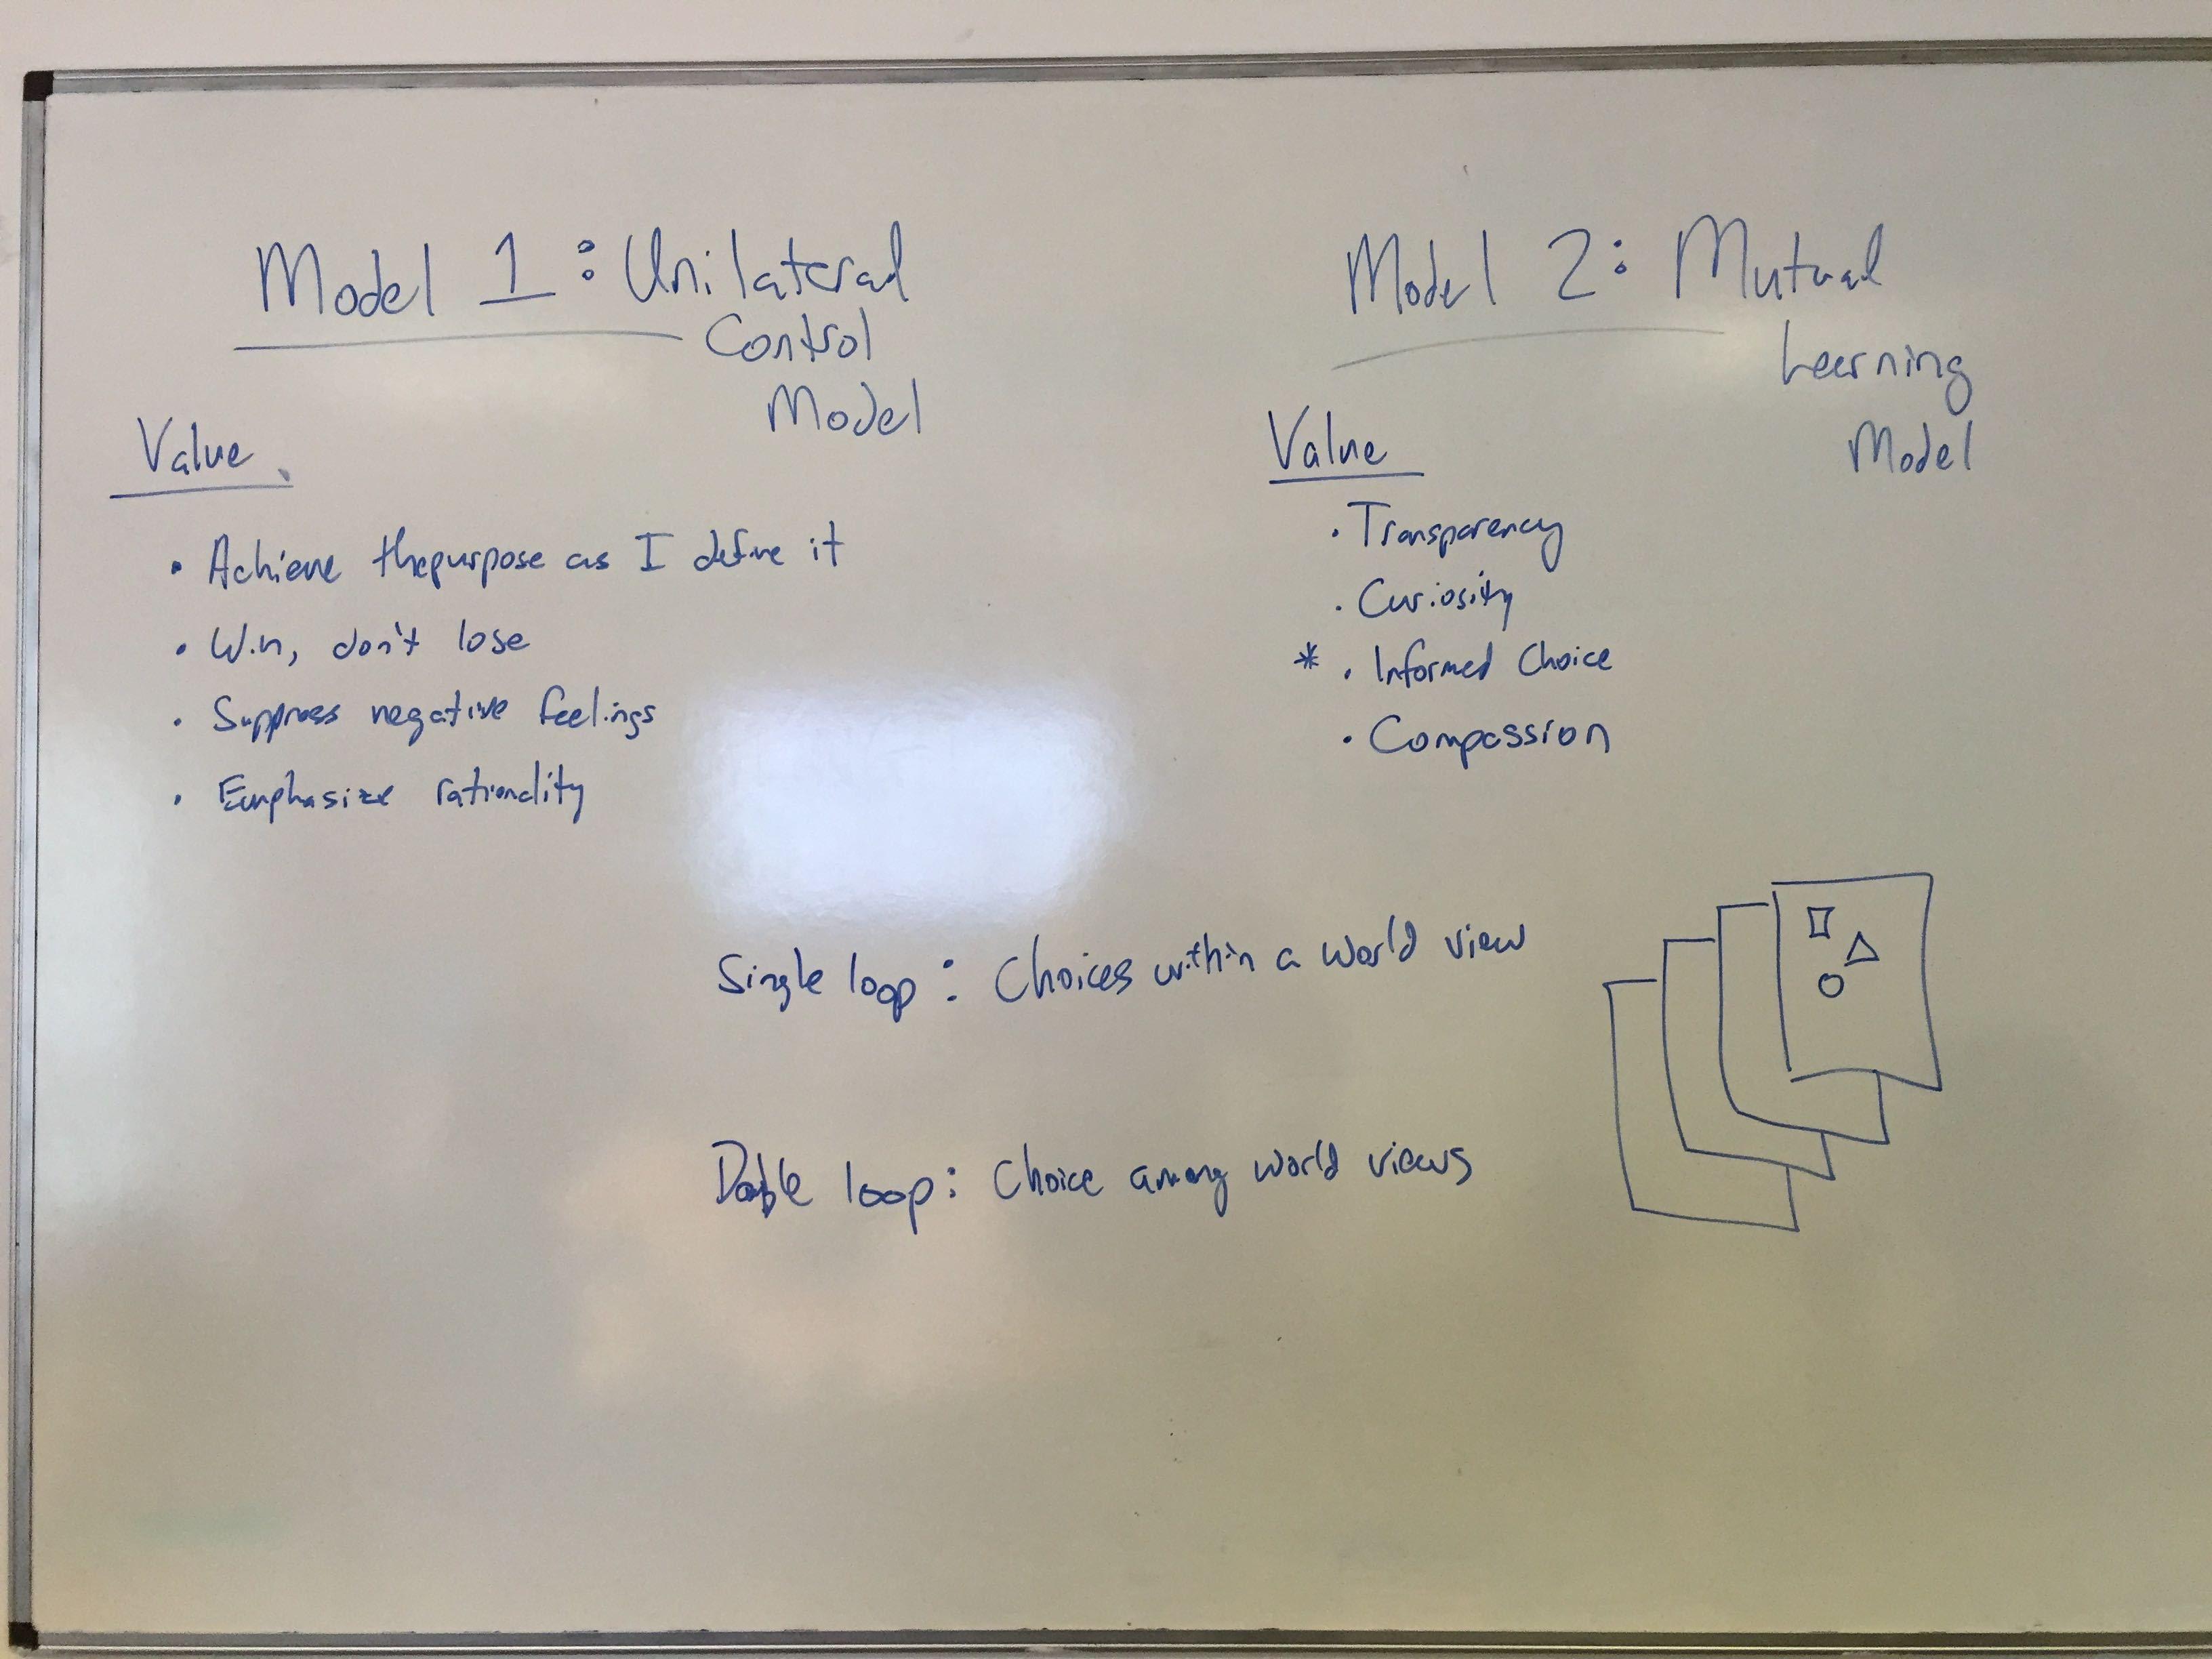 London Organizational Learning Meetup